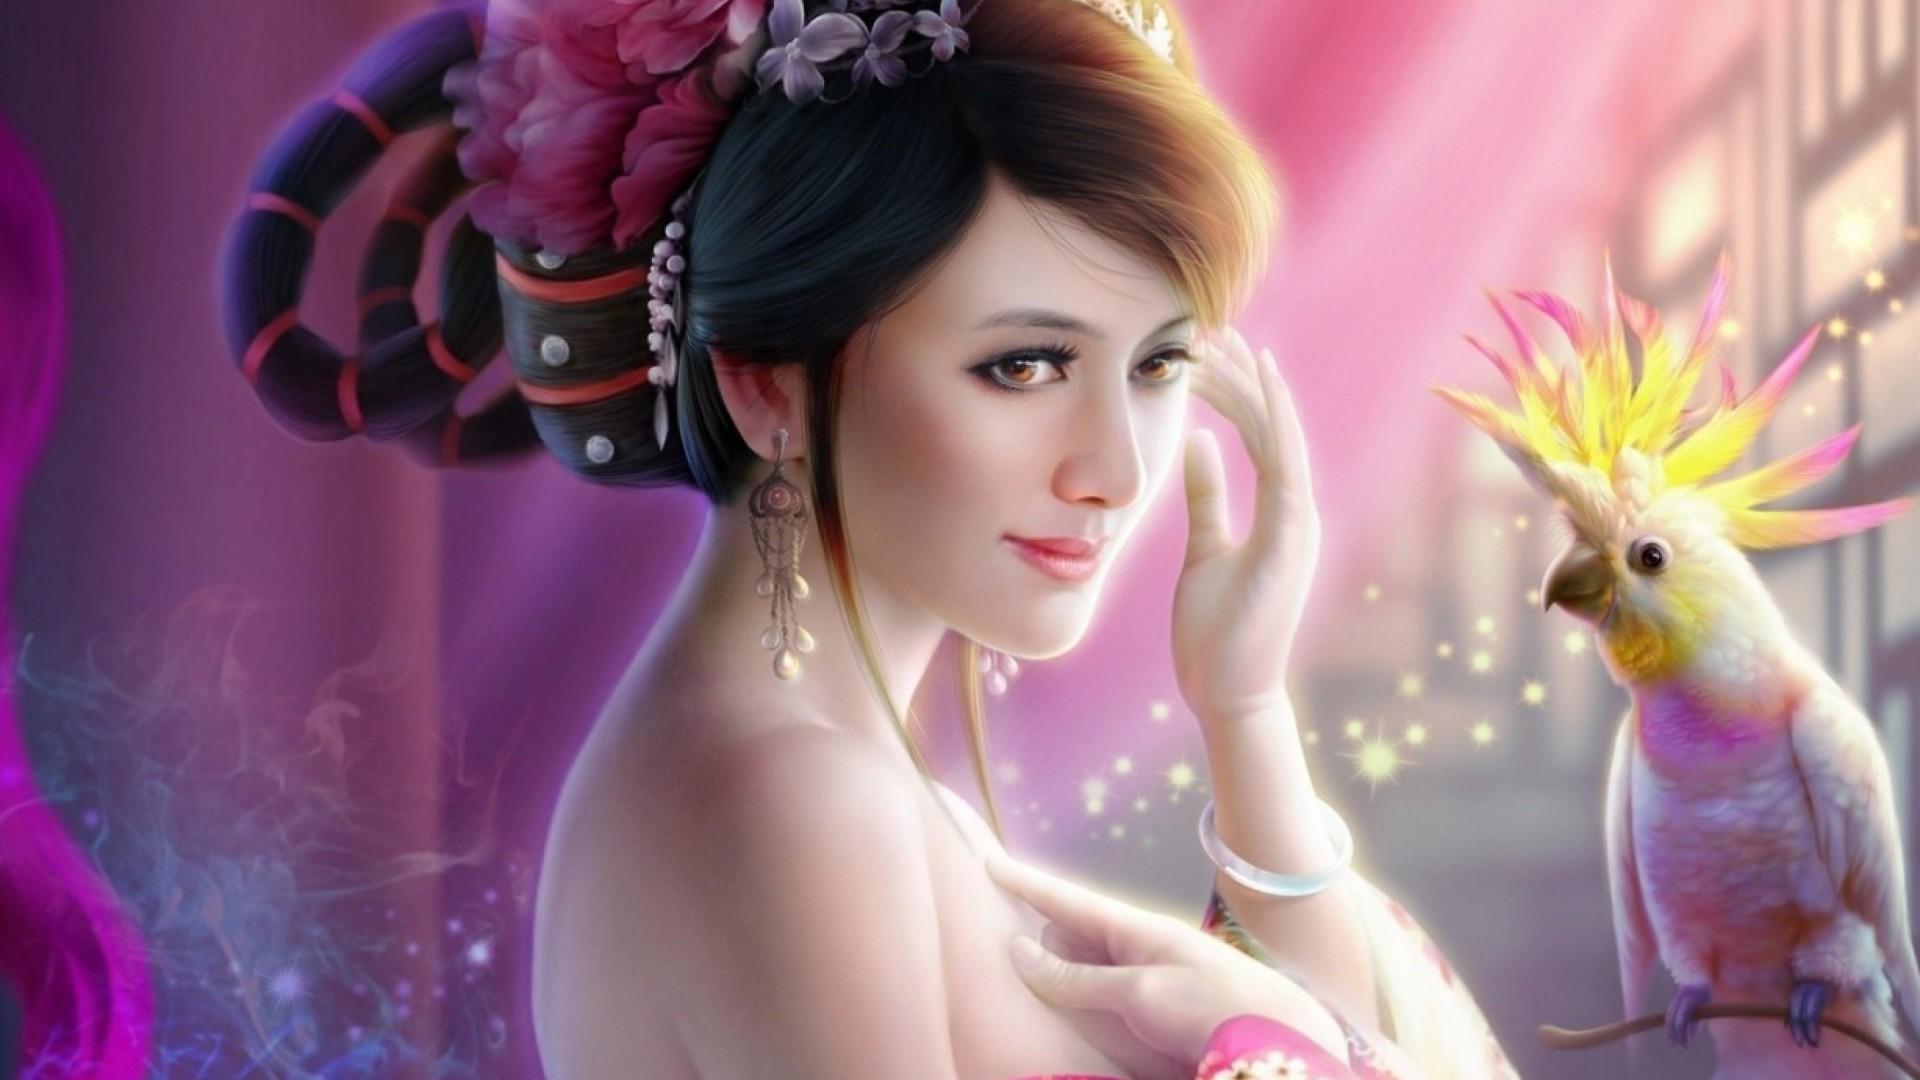 Beauty Wallpaper Girls - HD Wallpaper